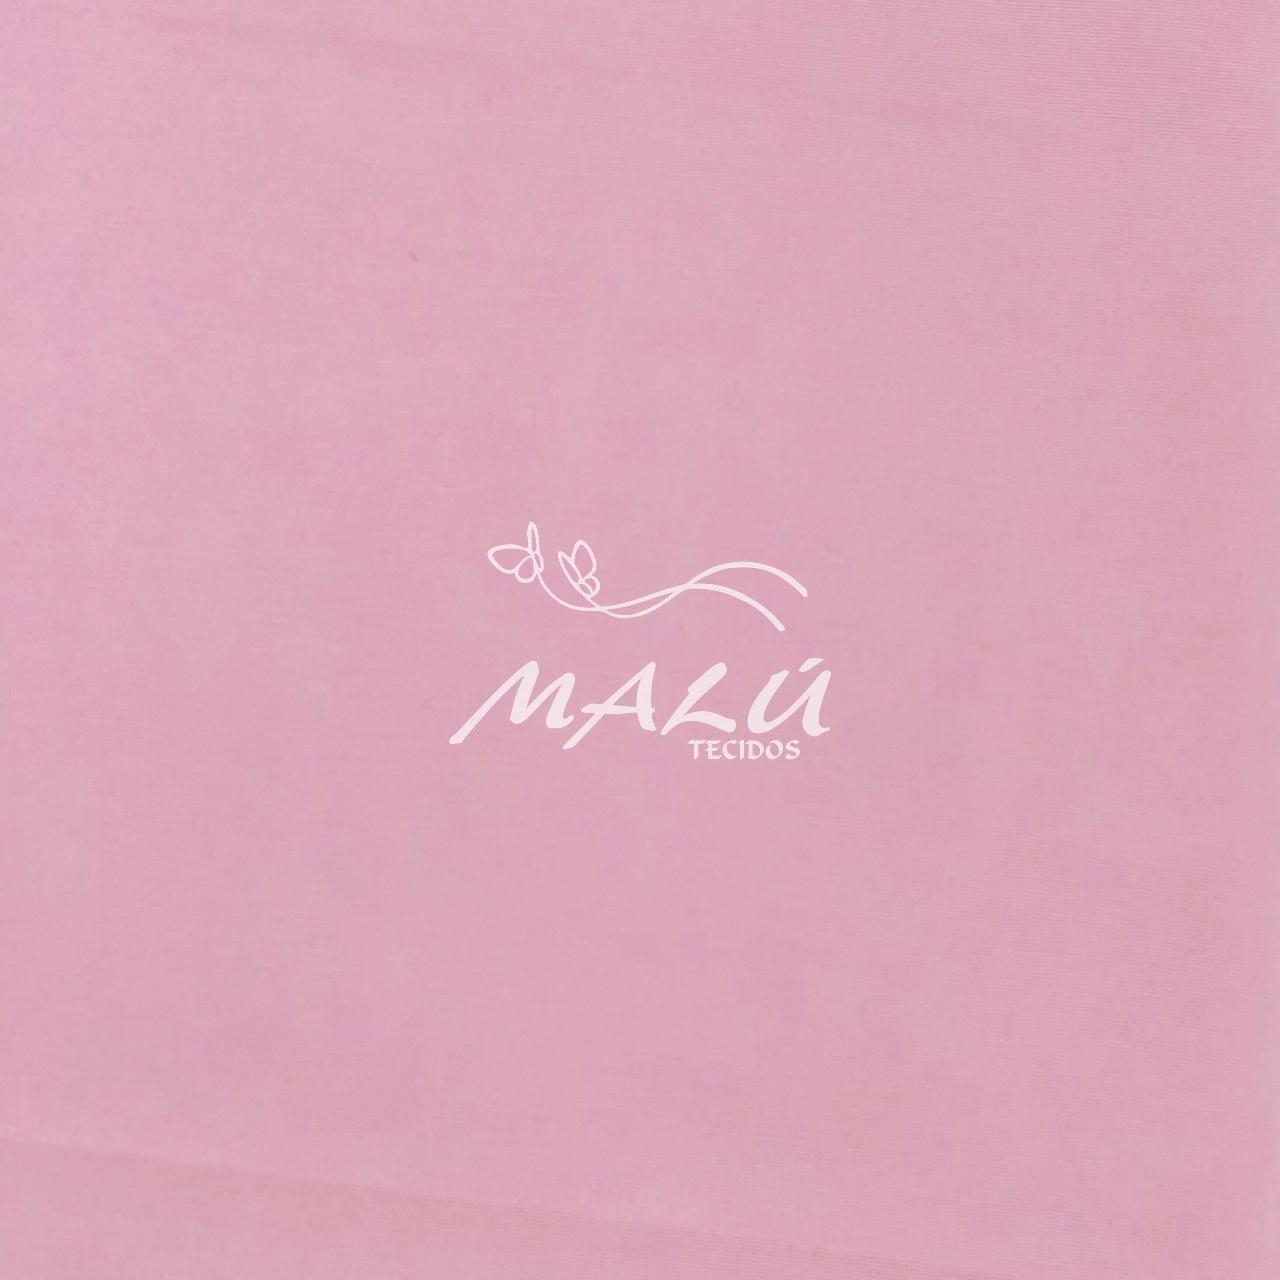 Lençol Elegance Rosa 2,45m Larg. 150 Fios 63%Alg.